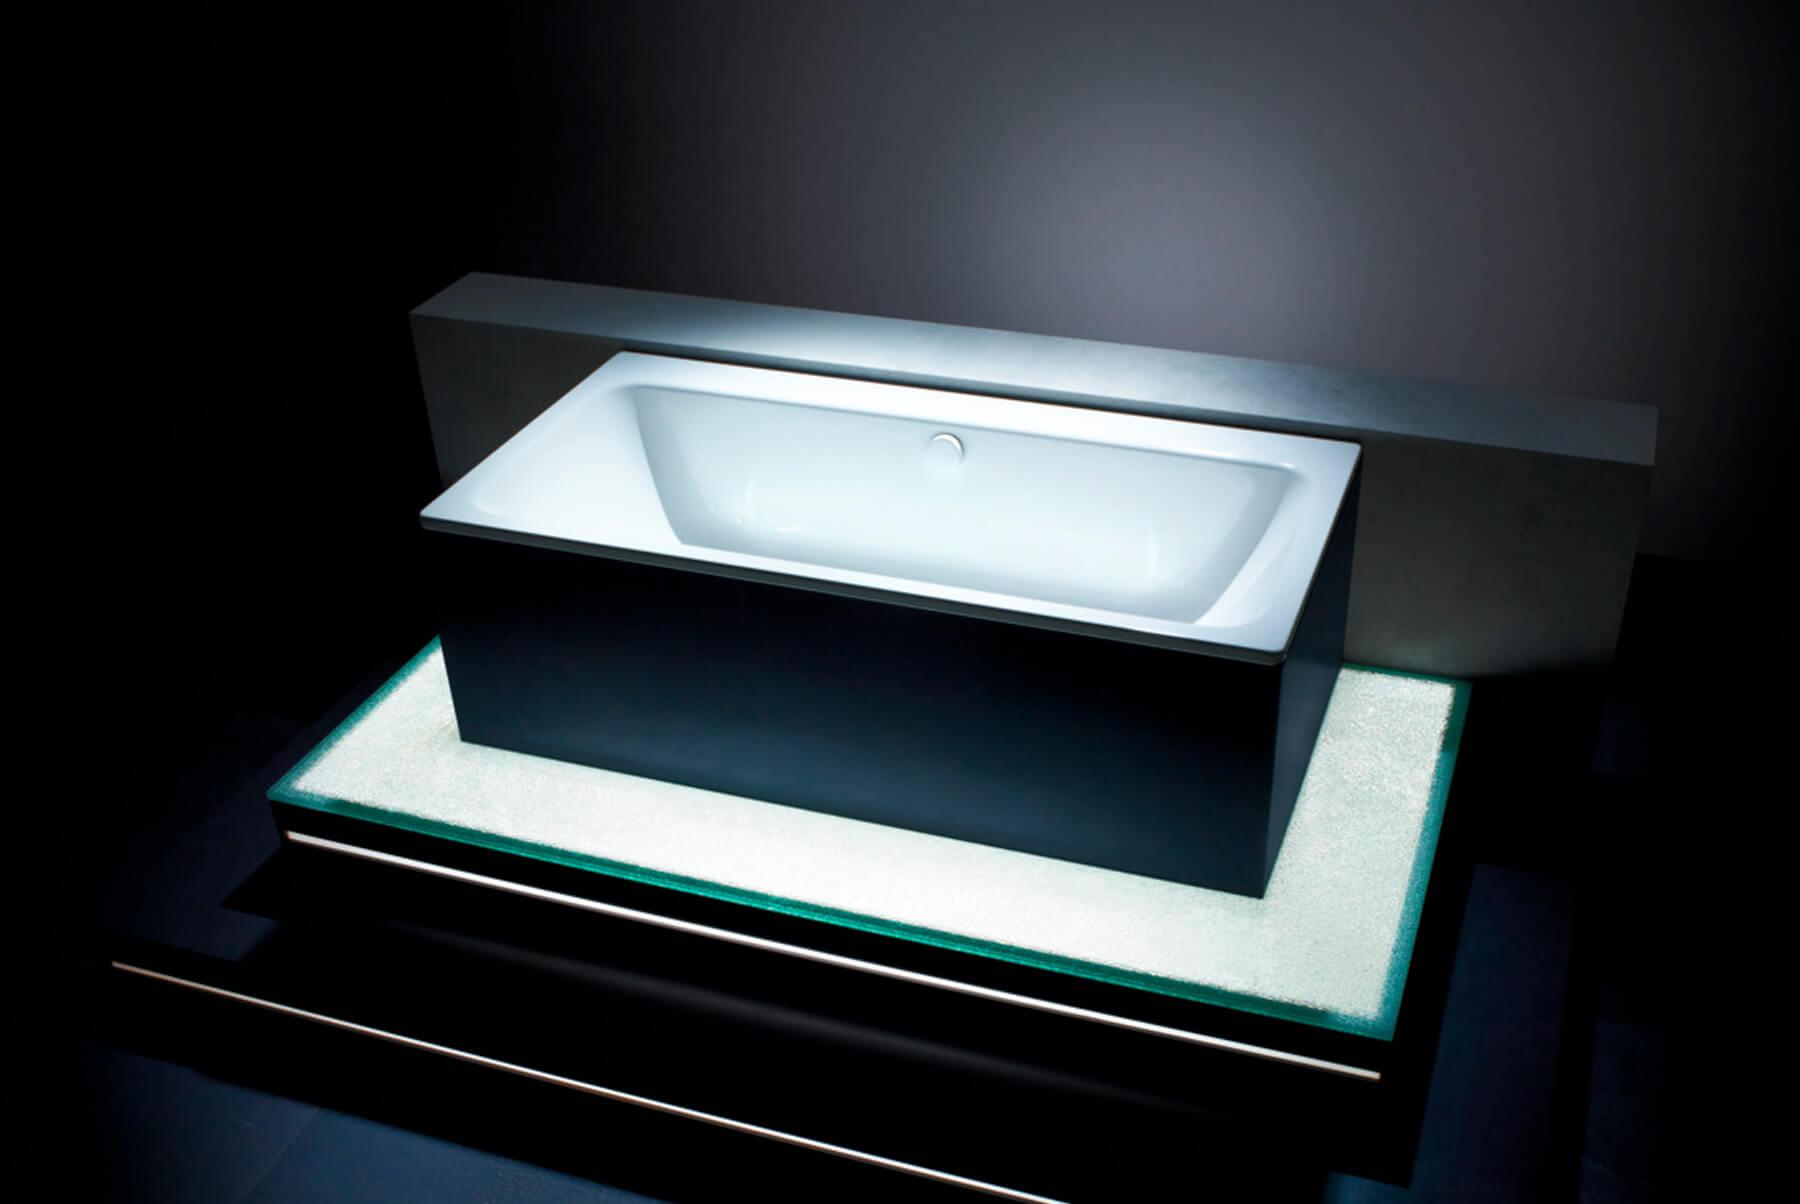 Bath-Tubs-Kaldewei-asymmetric-6-1800x1204